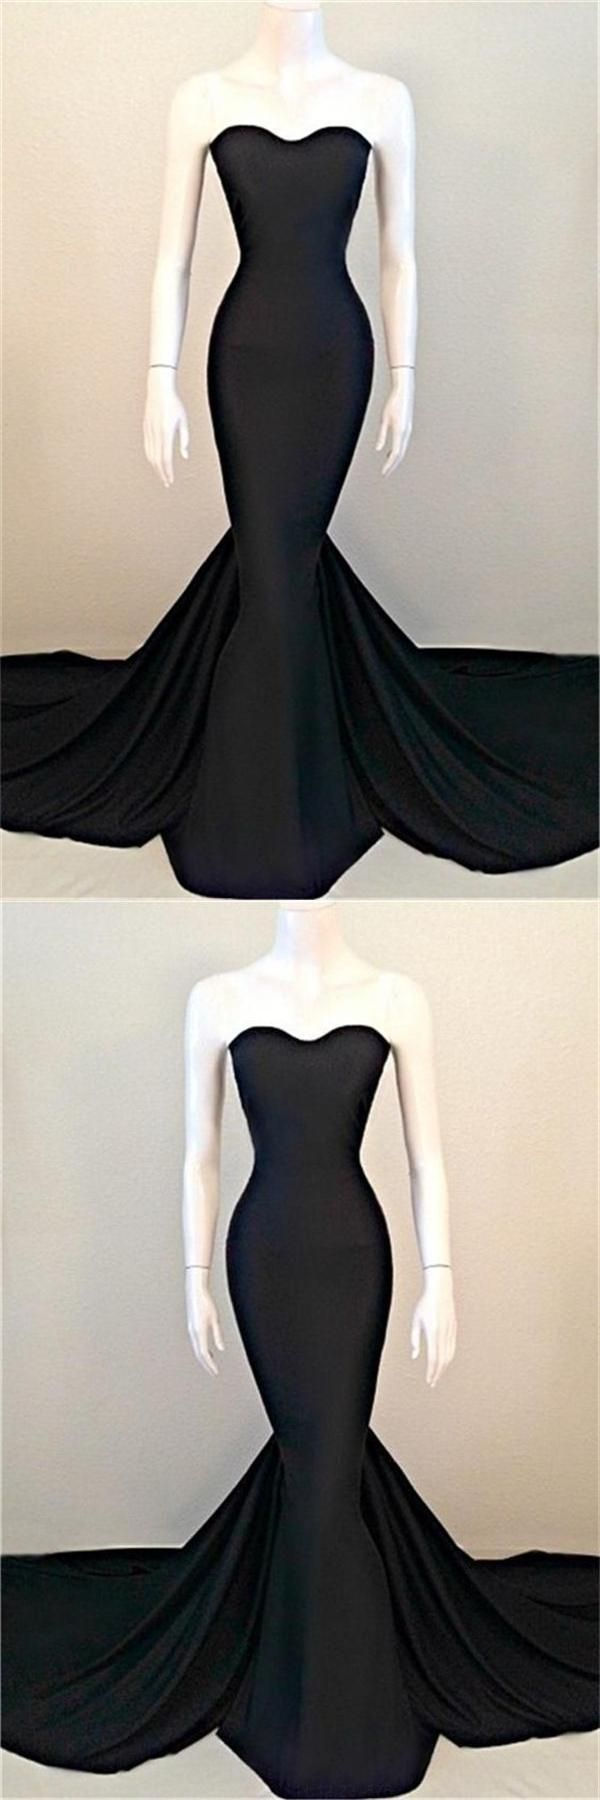 Black prom dresses prom dresses mermaid cheap prom dresses black